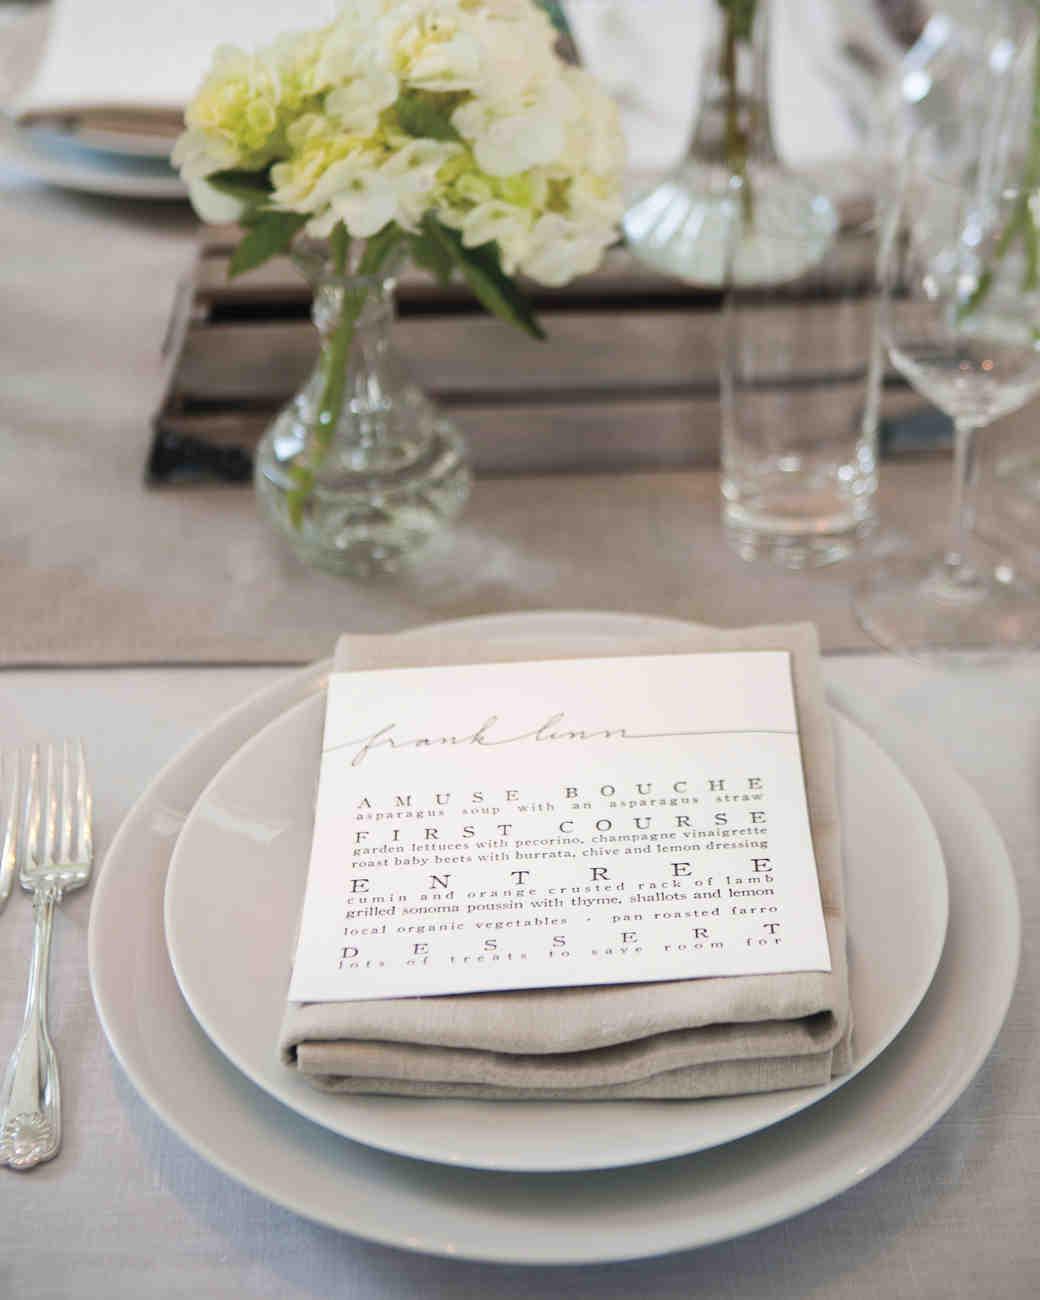 shoshana-jeremy-menu-0550-mwds110421.jpg